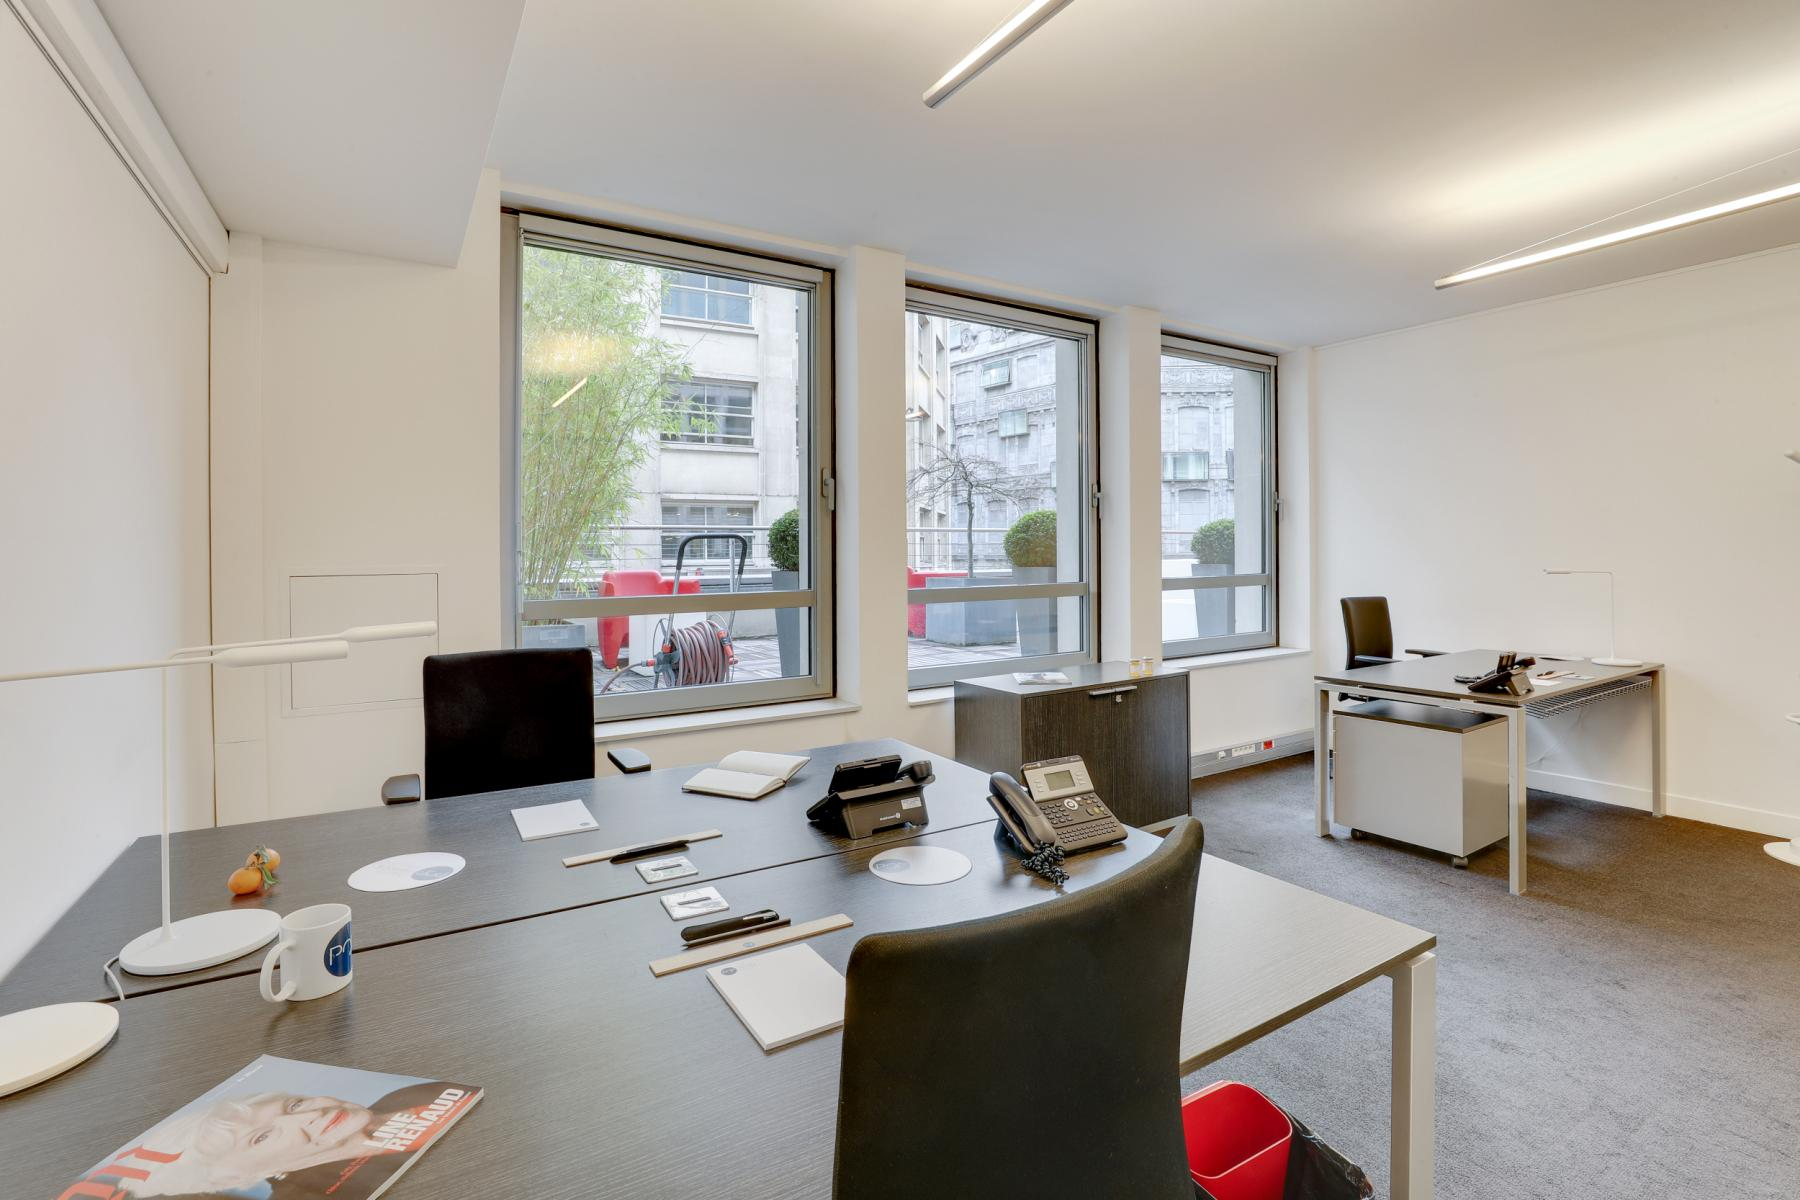 Location bureau Rue Quentin-Bauchart 20, Paris (6)